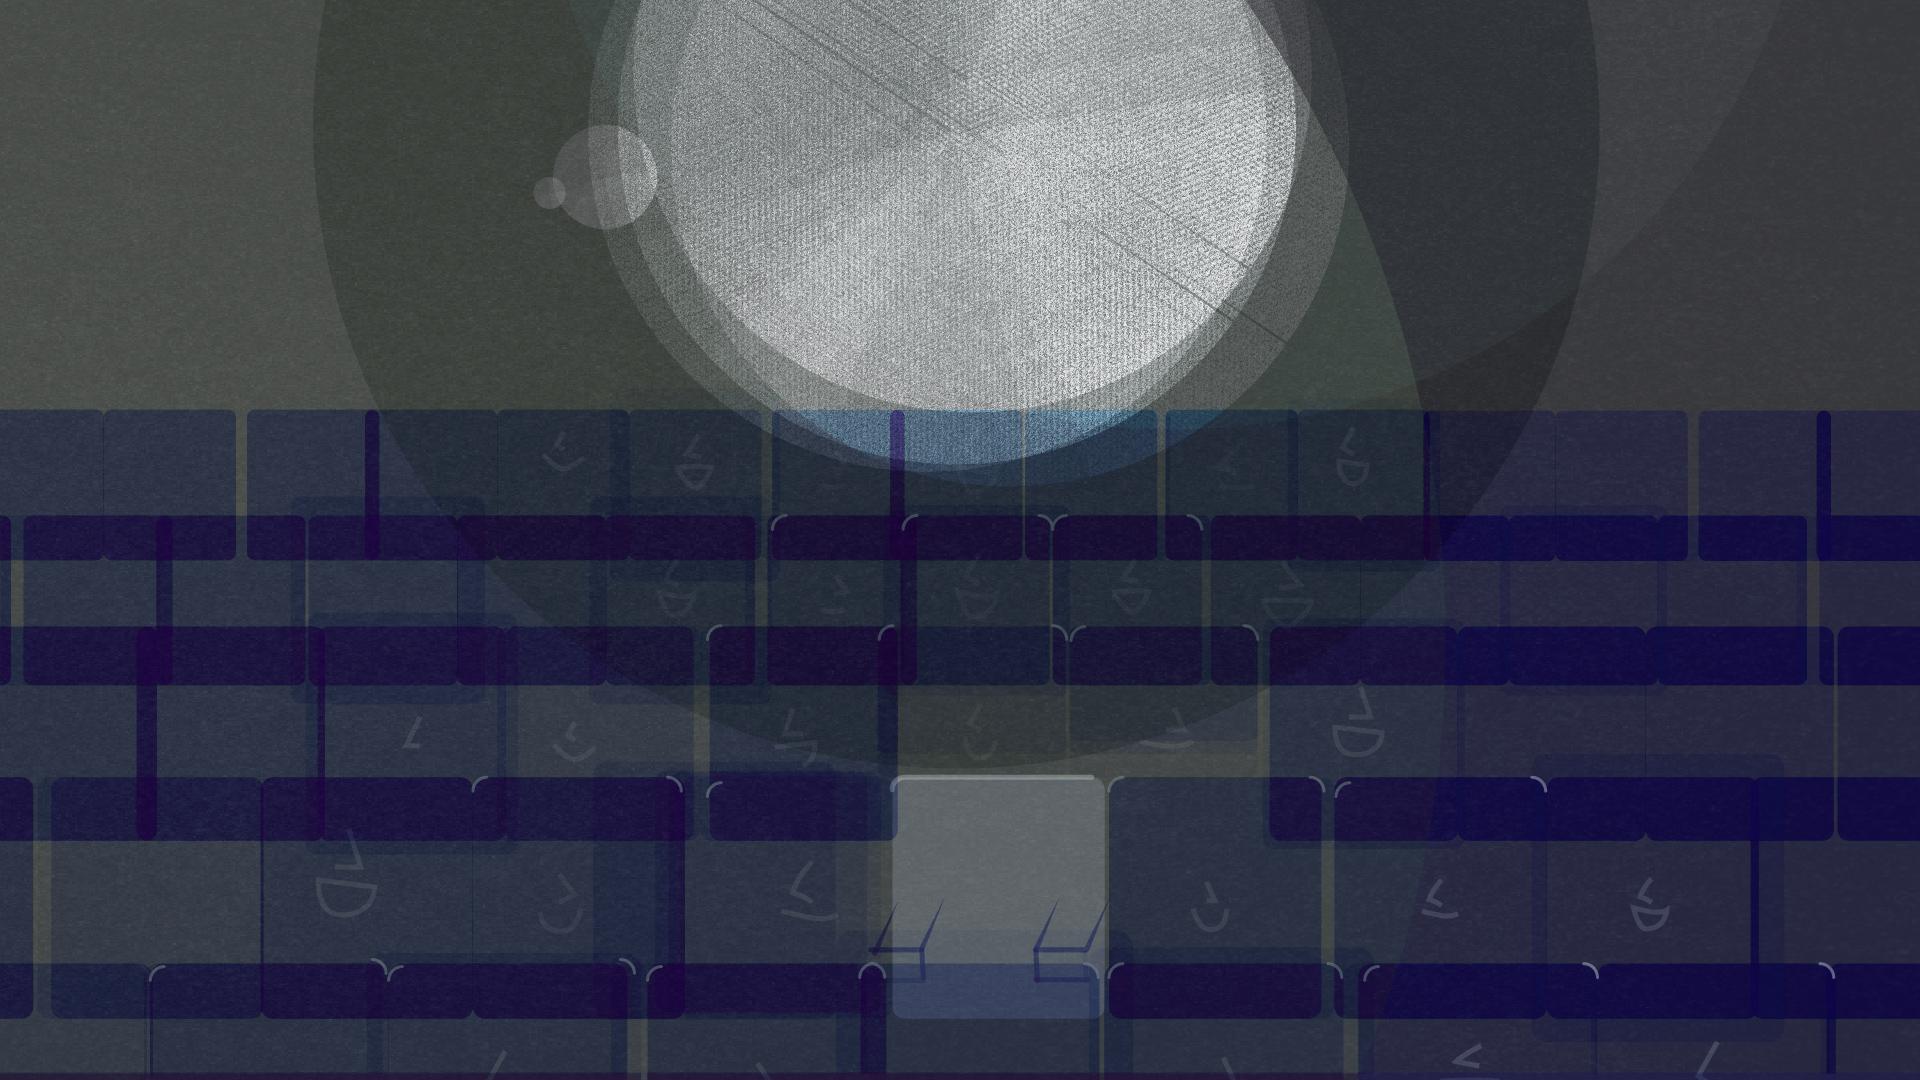 Mograph C3 Lollipop 050-01.jpg